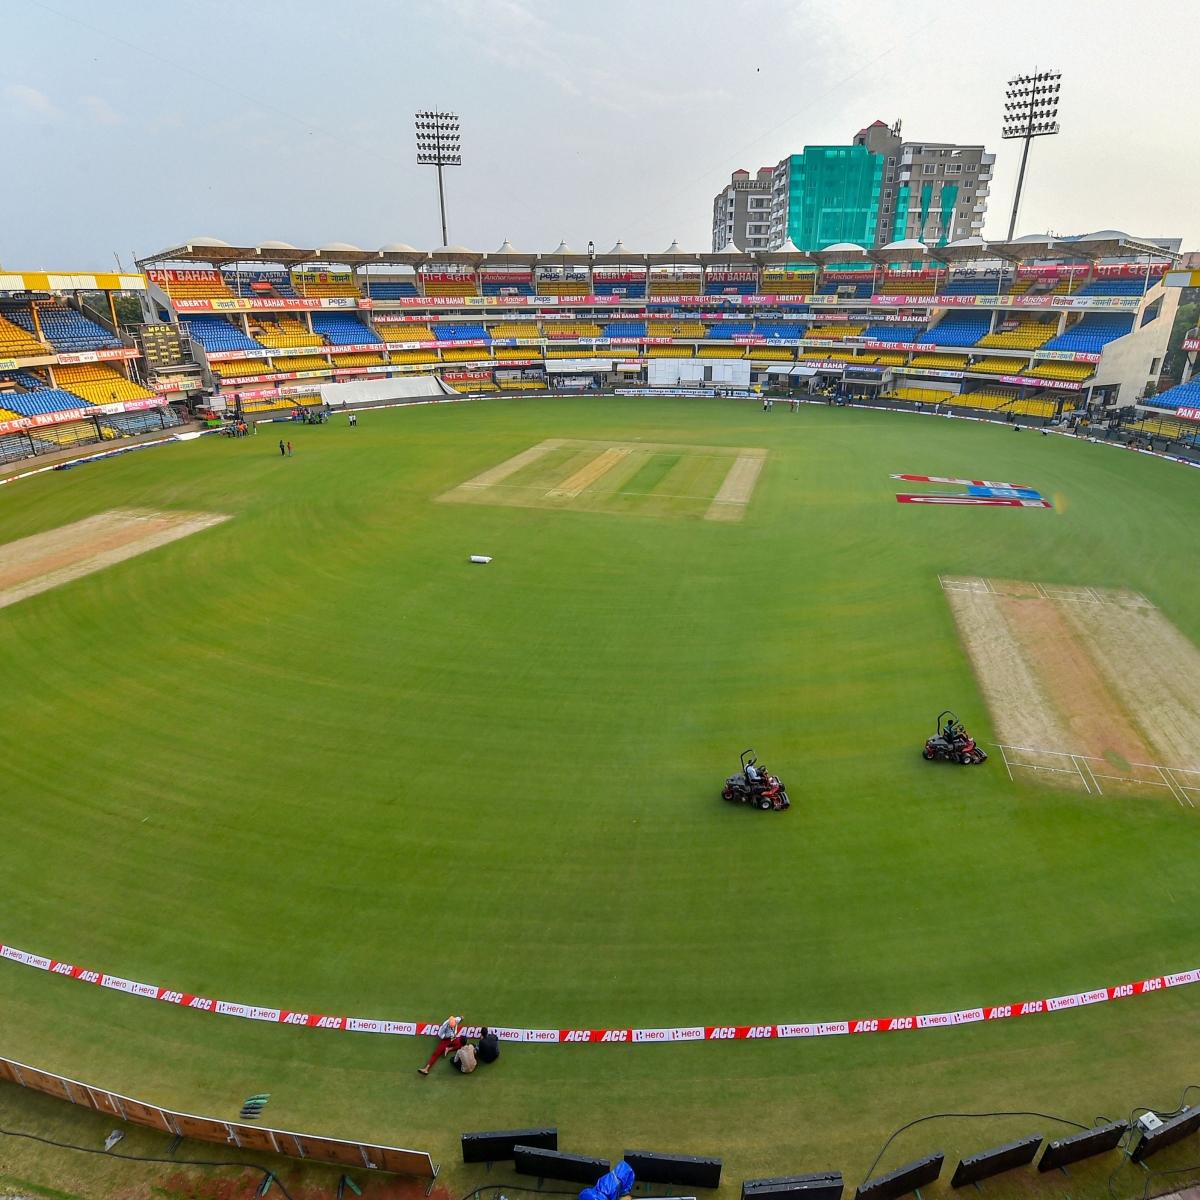 Indore: Holkar decked-up for Red Test